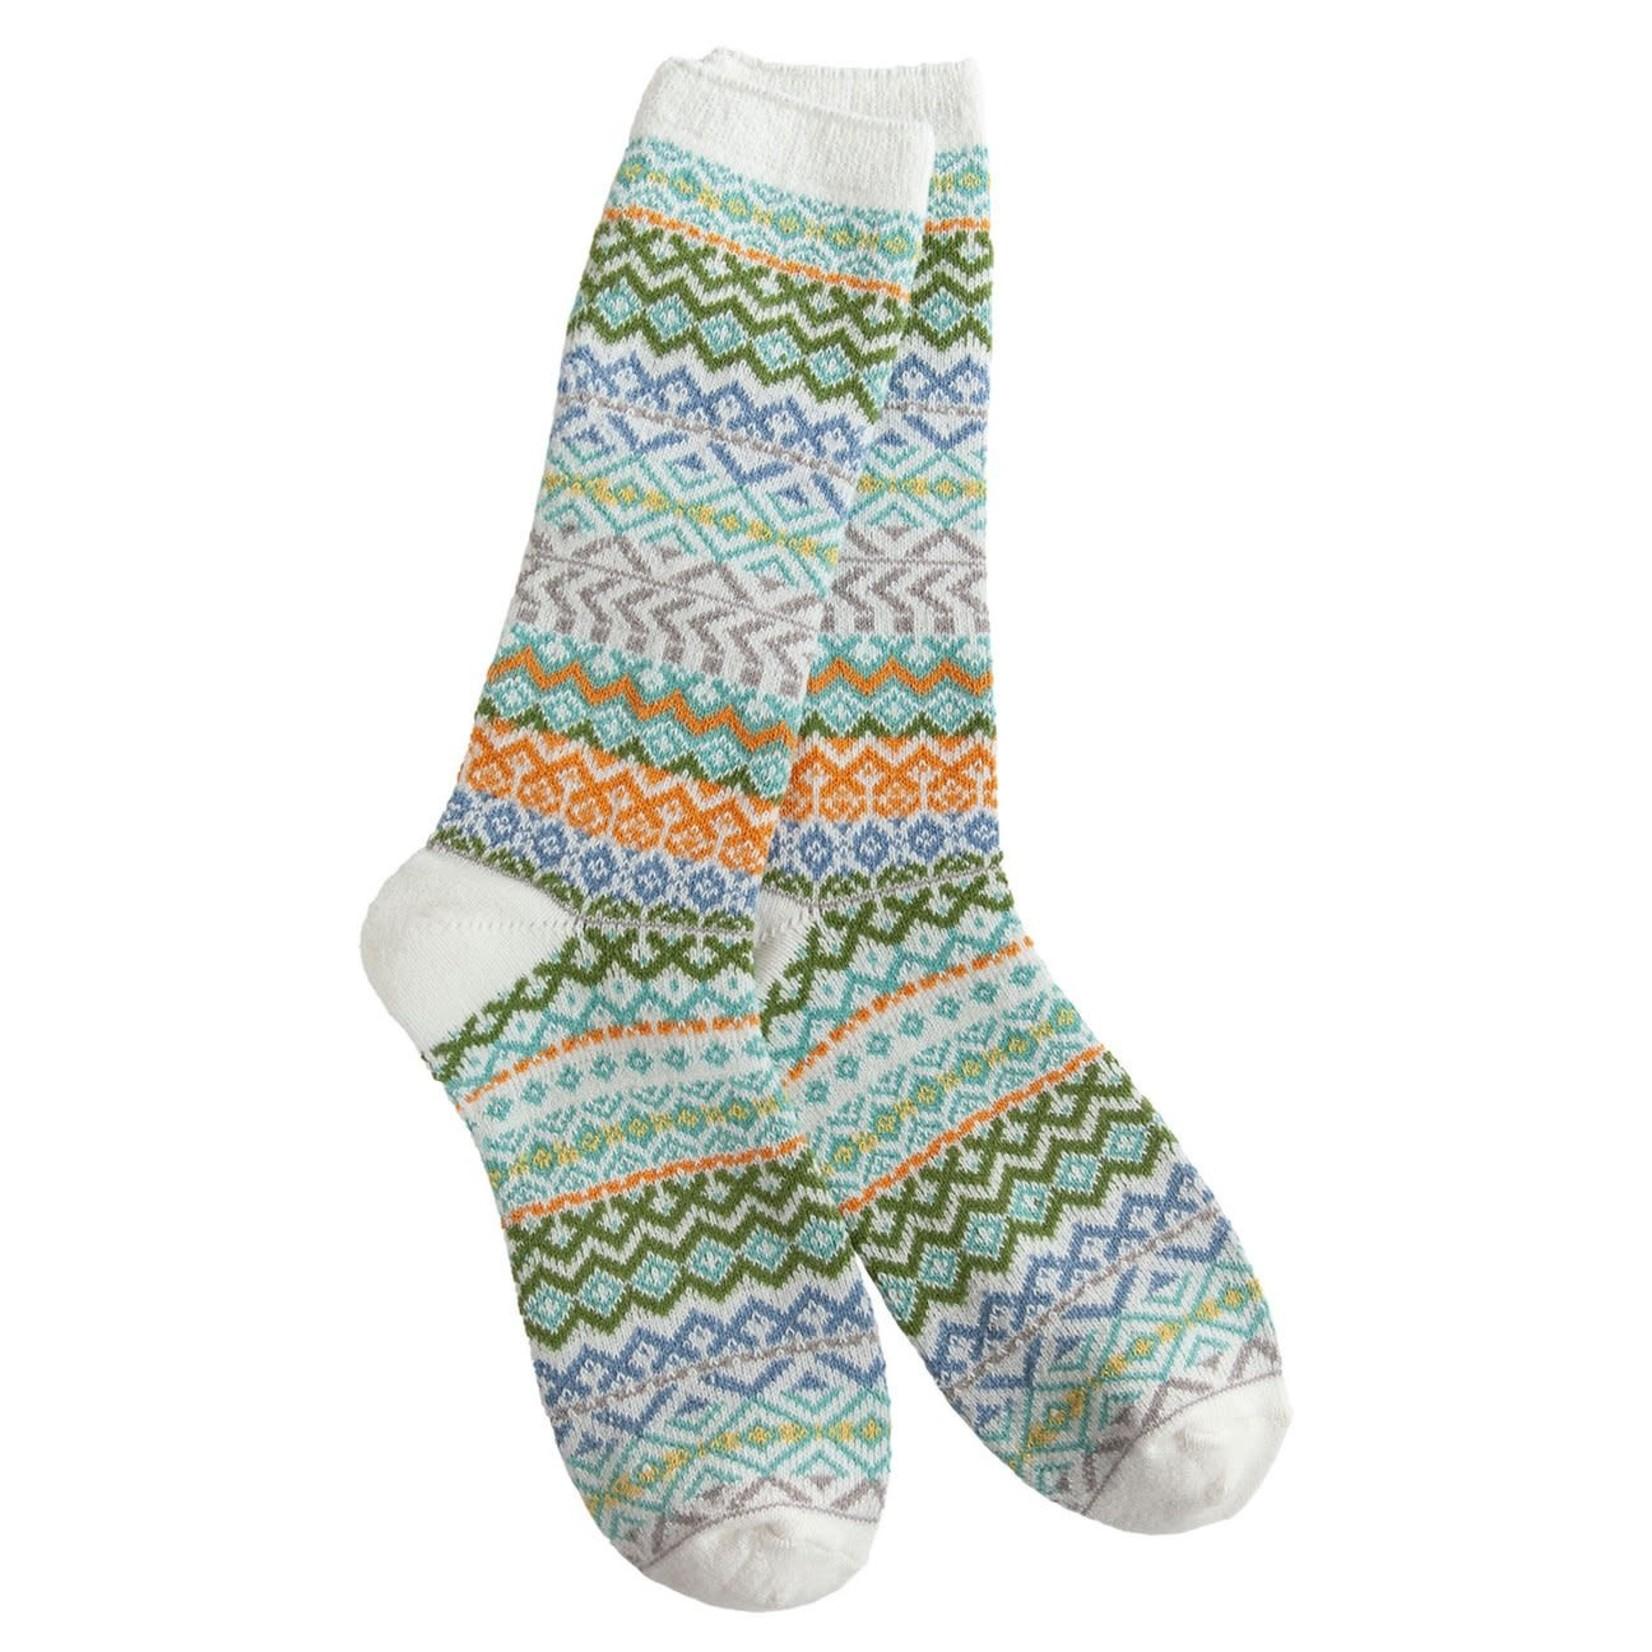 World's Softest Weekend Studio Crew Socks - Winter Mood